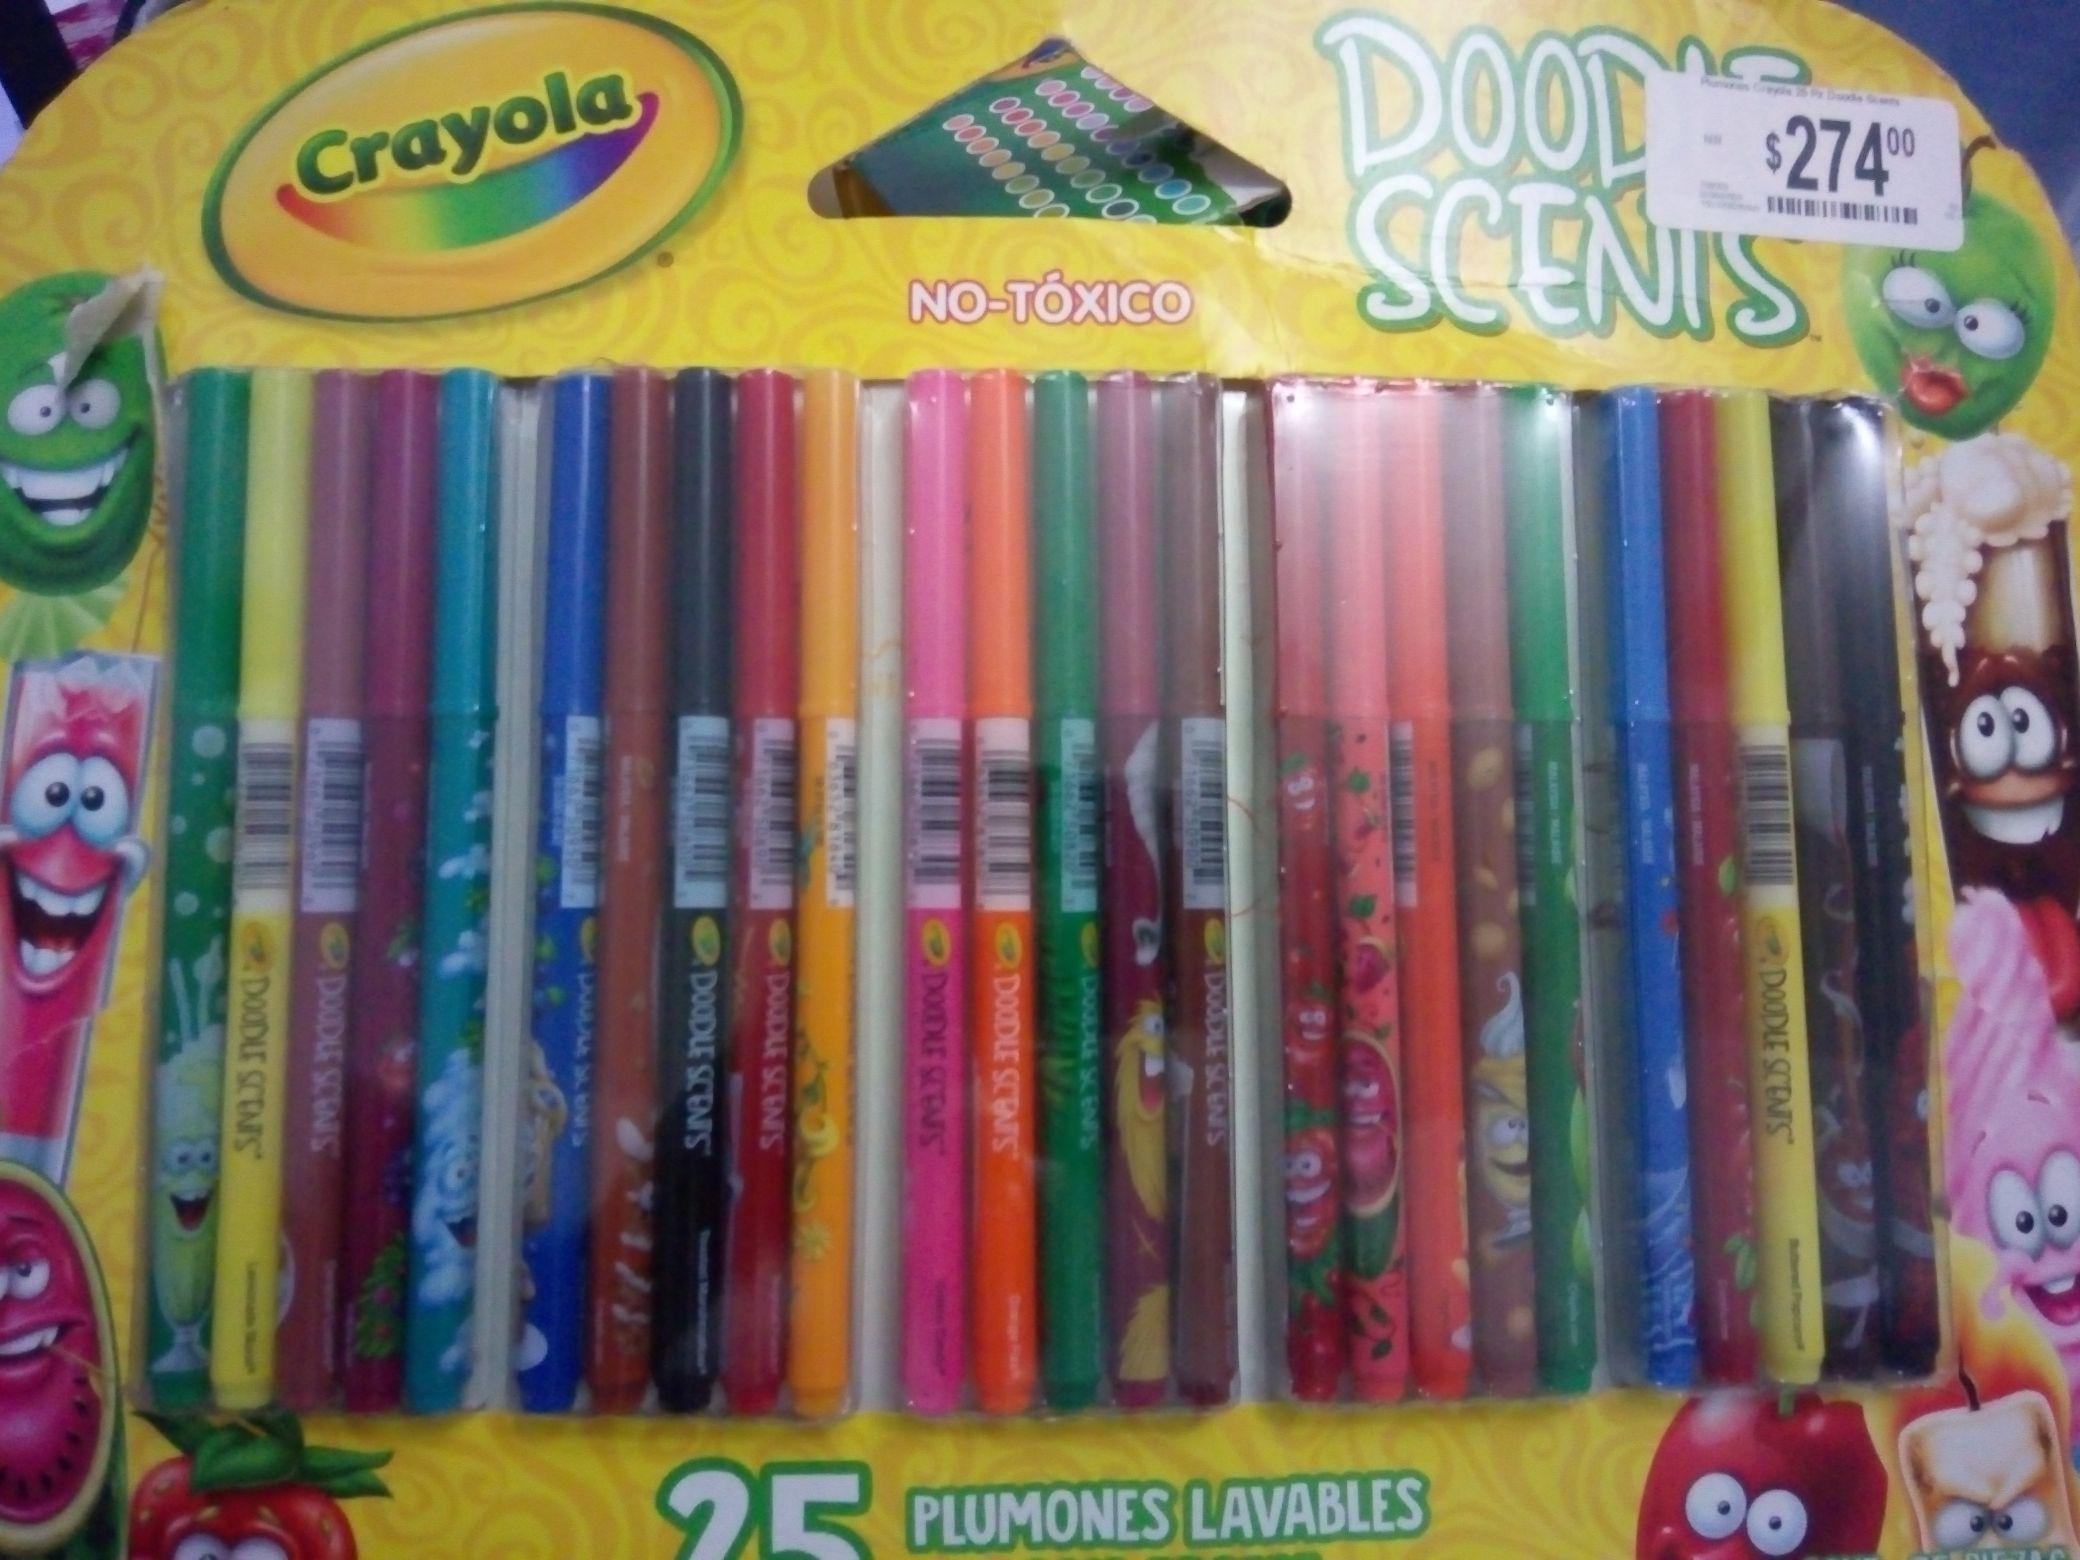 Chedraui: Plumones crayola Doodle Scents